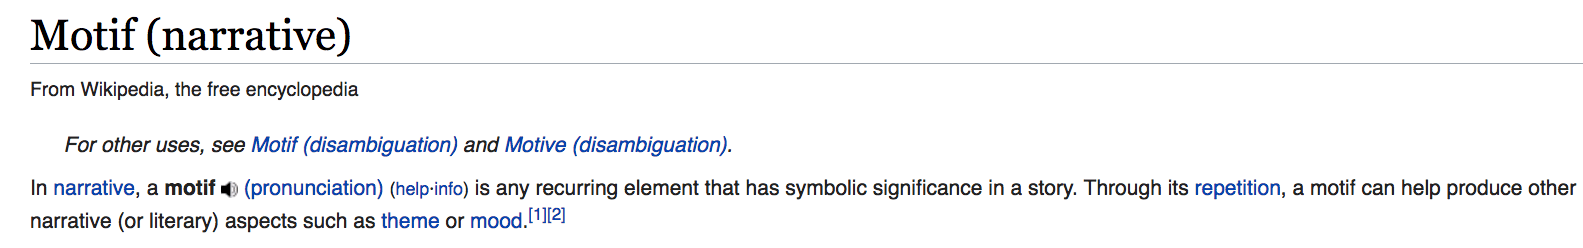 Wikipedia definition of motif